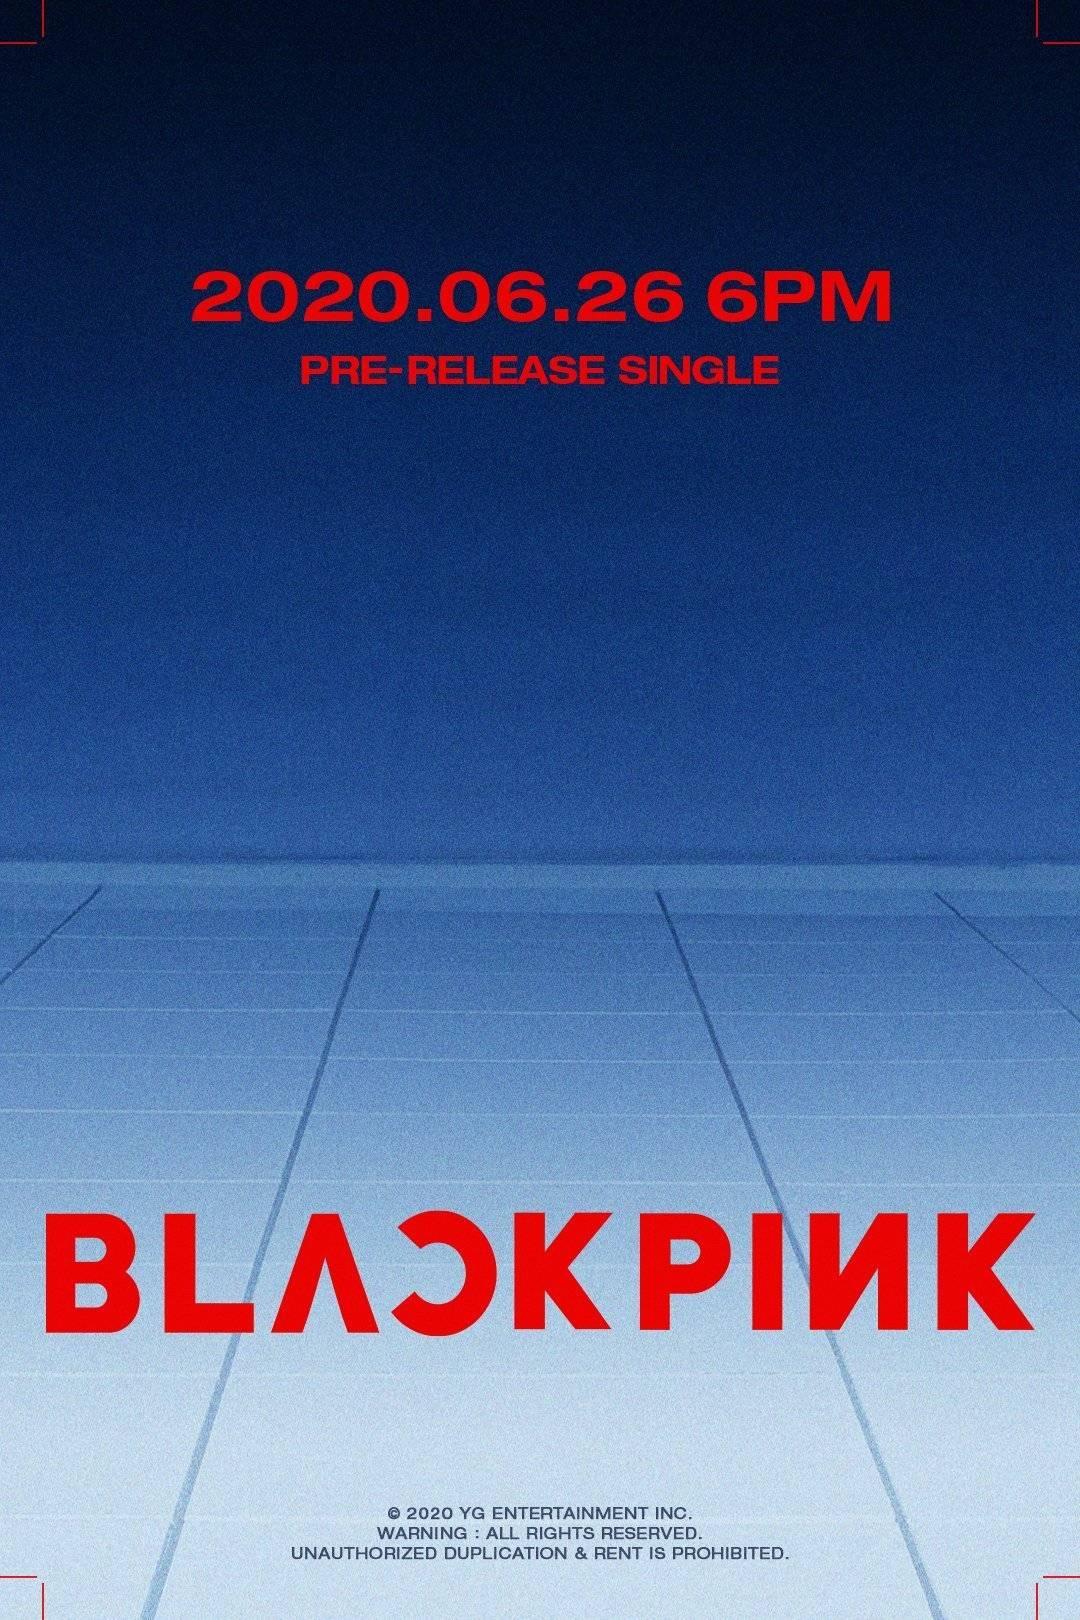 BLACKPINK确定回归日期,6月26日公开先行曲